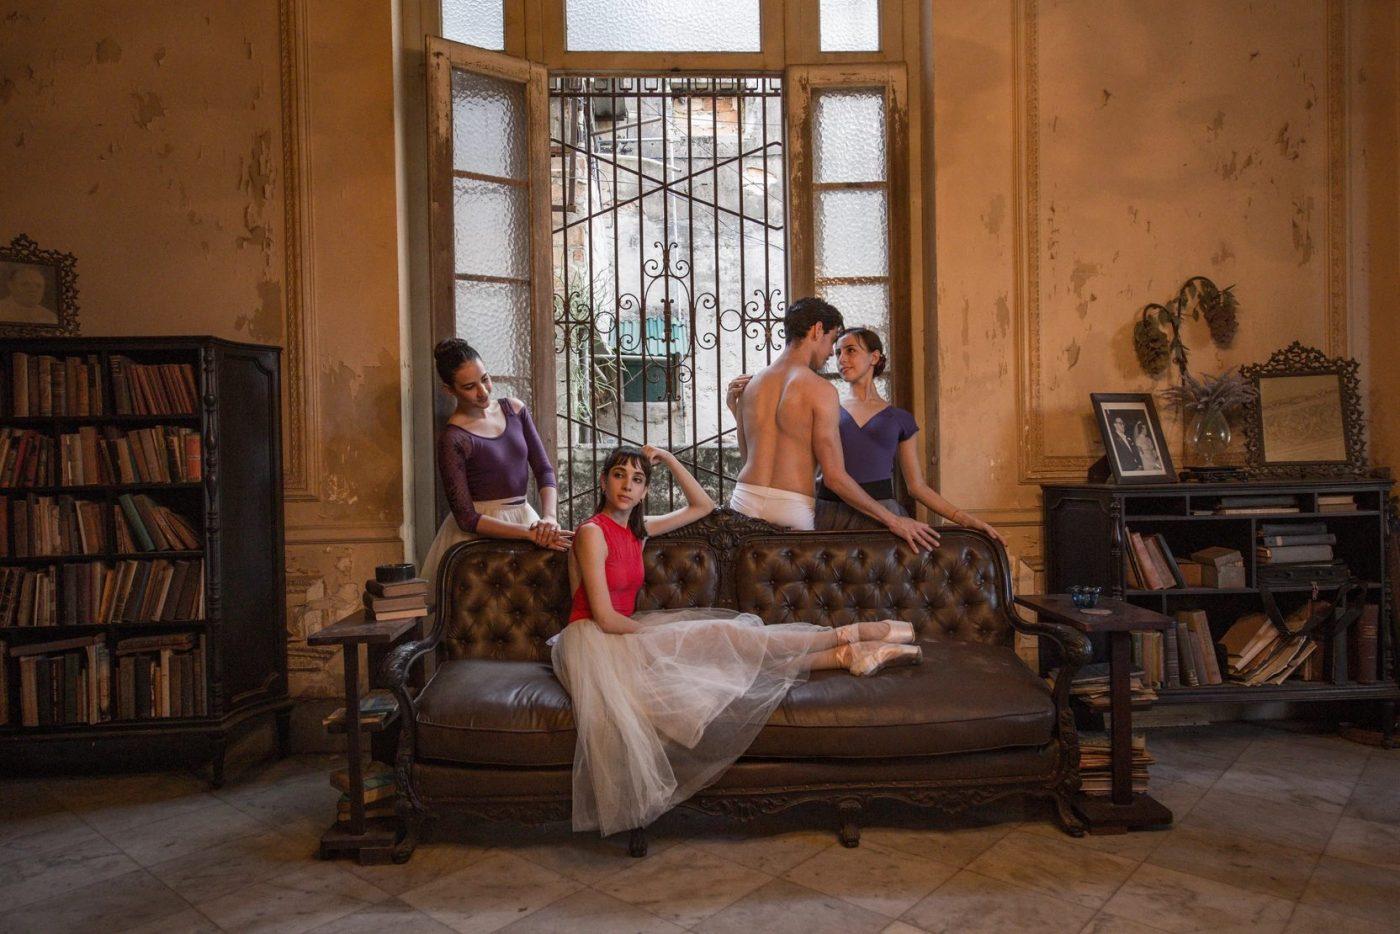 Vintage Havanna (8) by Robin Yong